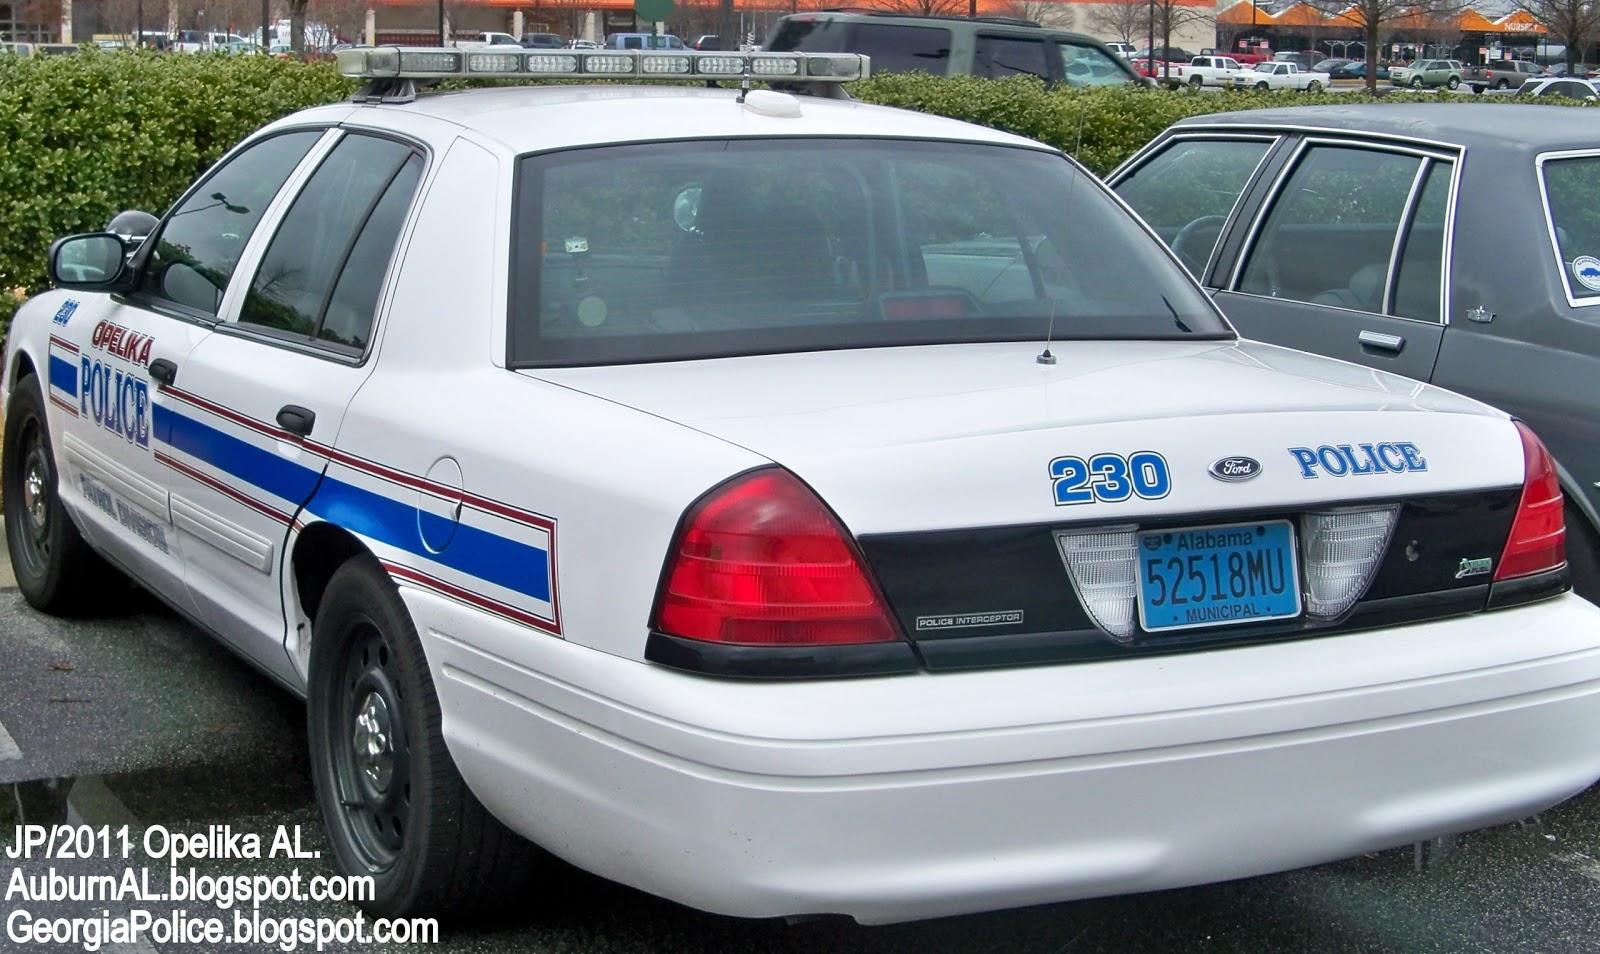 Alabama lee county salem - Opelika Alabama Police Department Patrol Car Lee County Al Opelika Police Dept Squad Car Auburn Alabama Law Enforcement